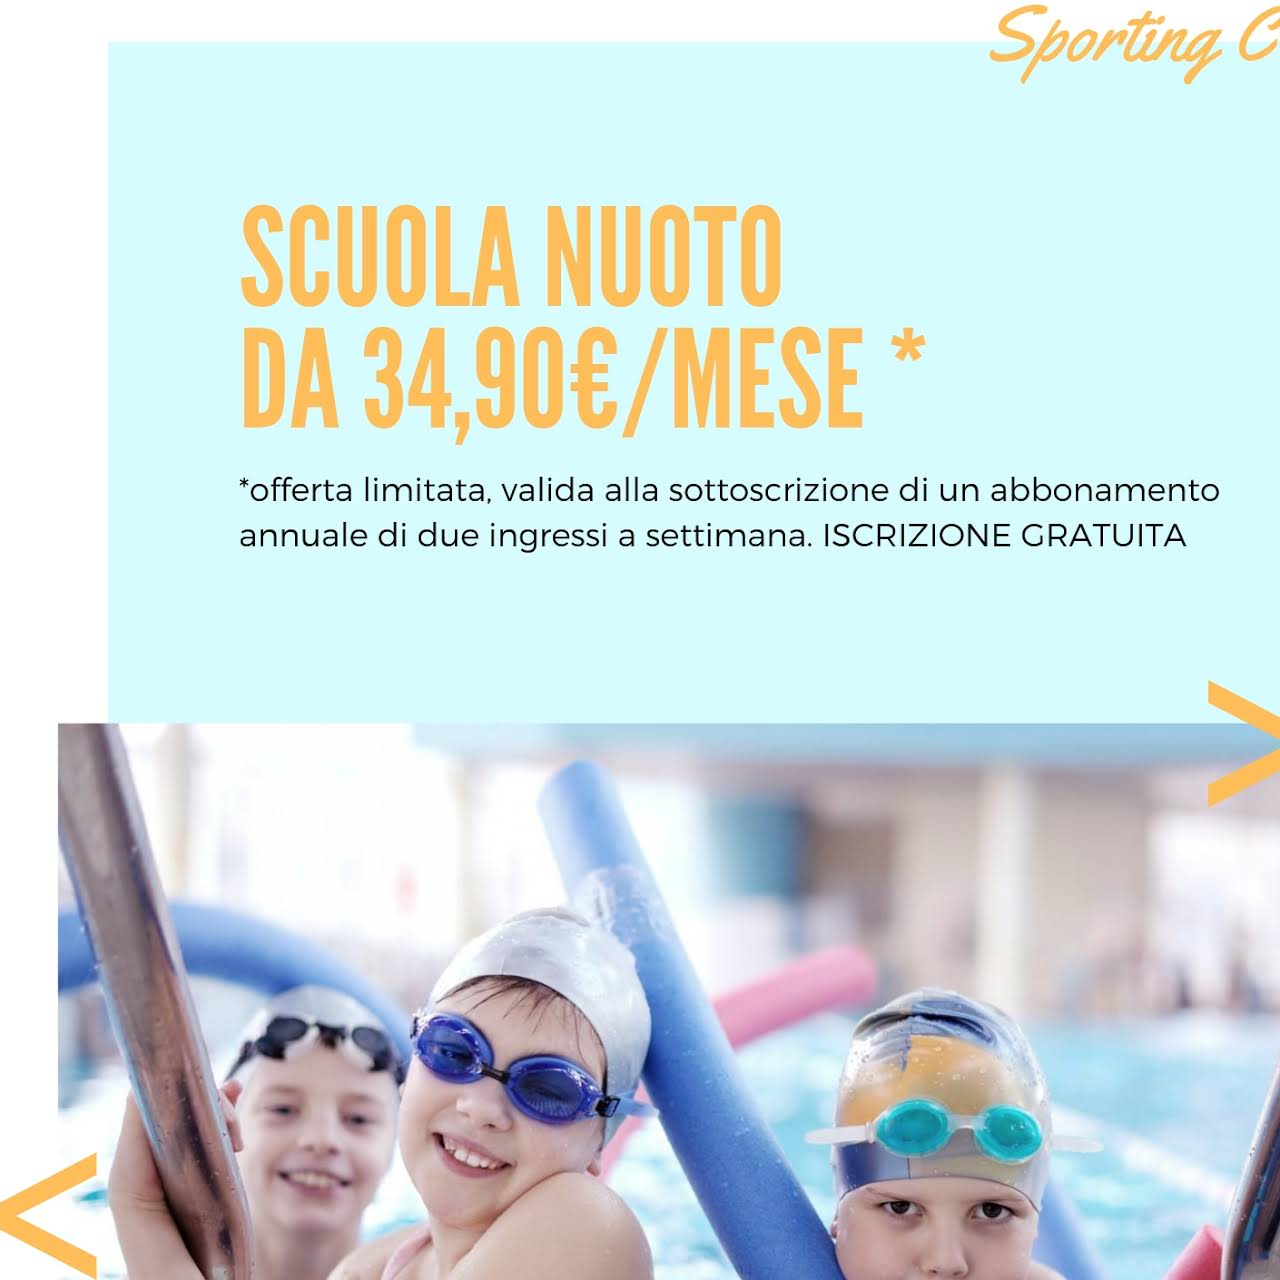 Piscine A Nocera Inferiore sporting club nocera inferiore - piscina e palestra a nocera